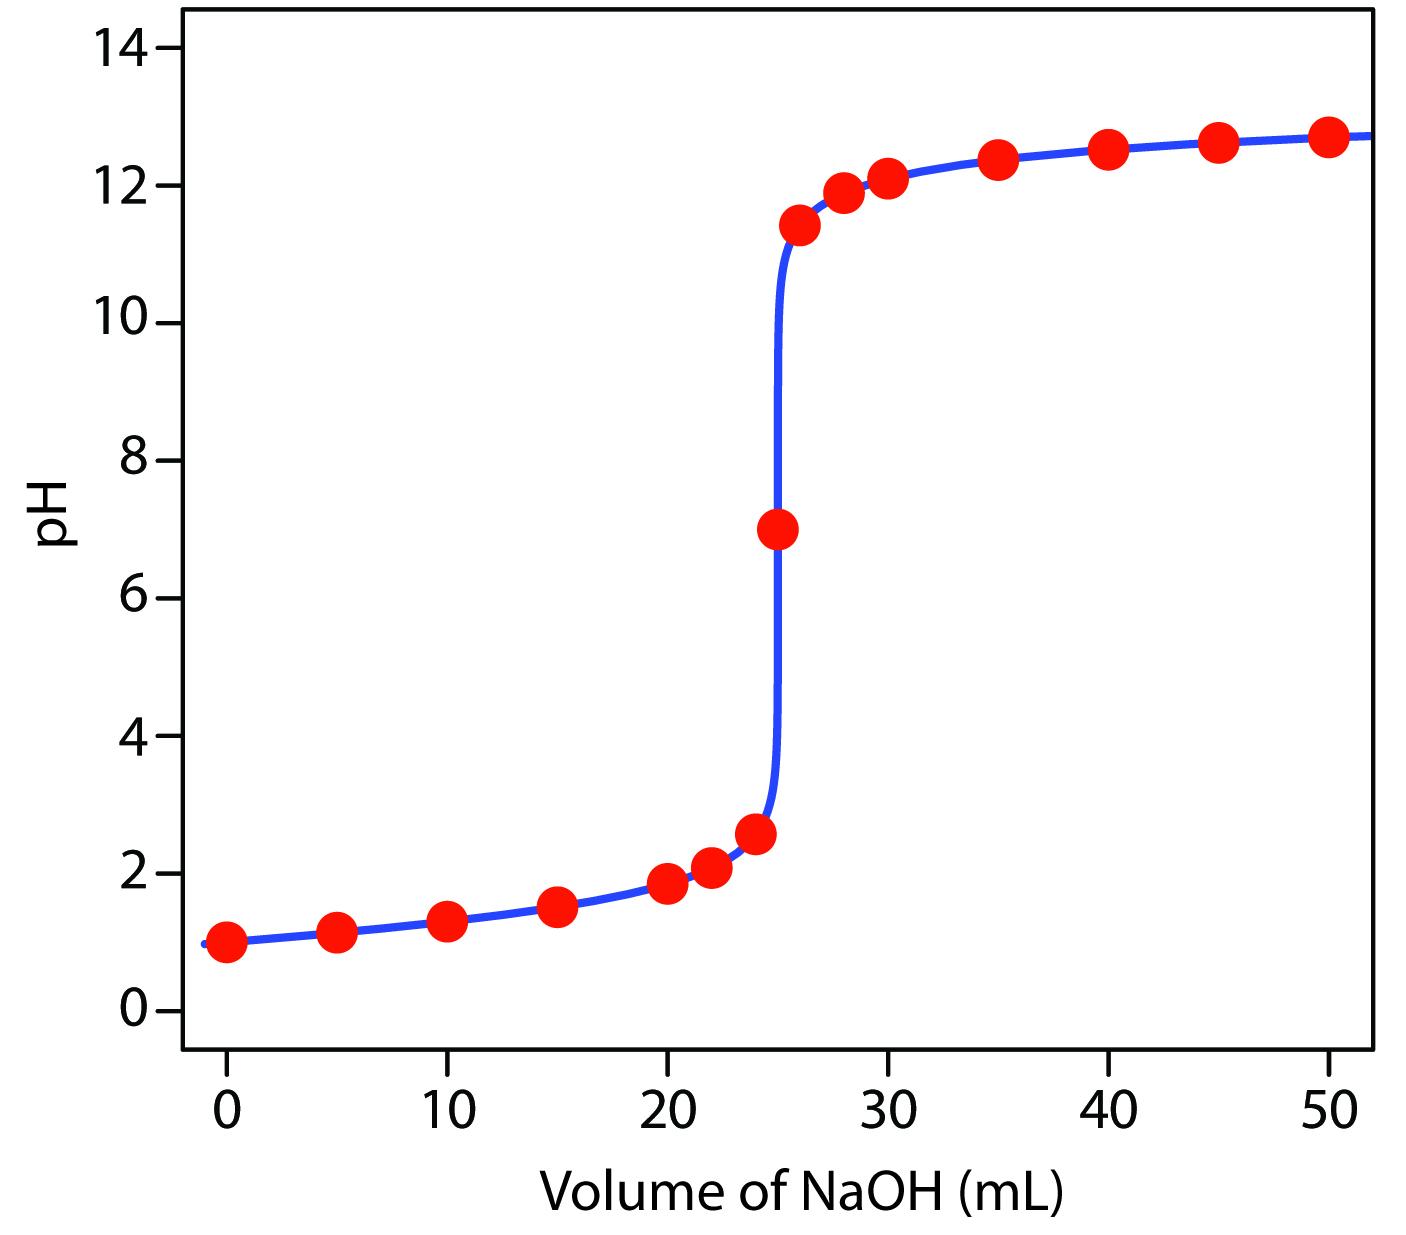 Titration Curve #1